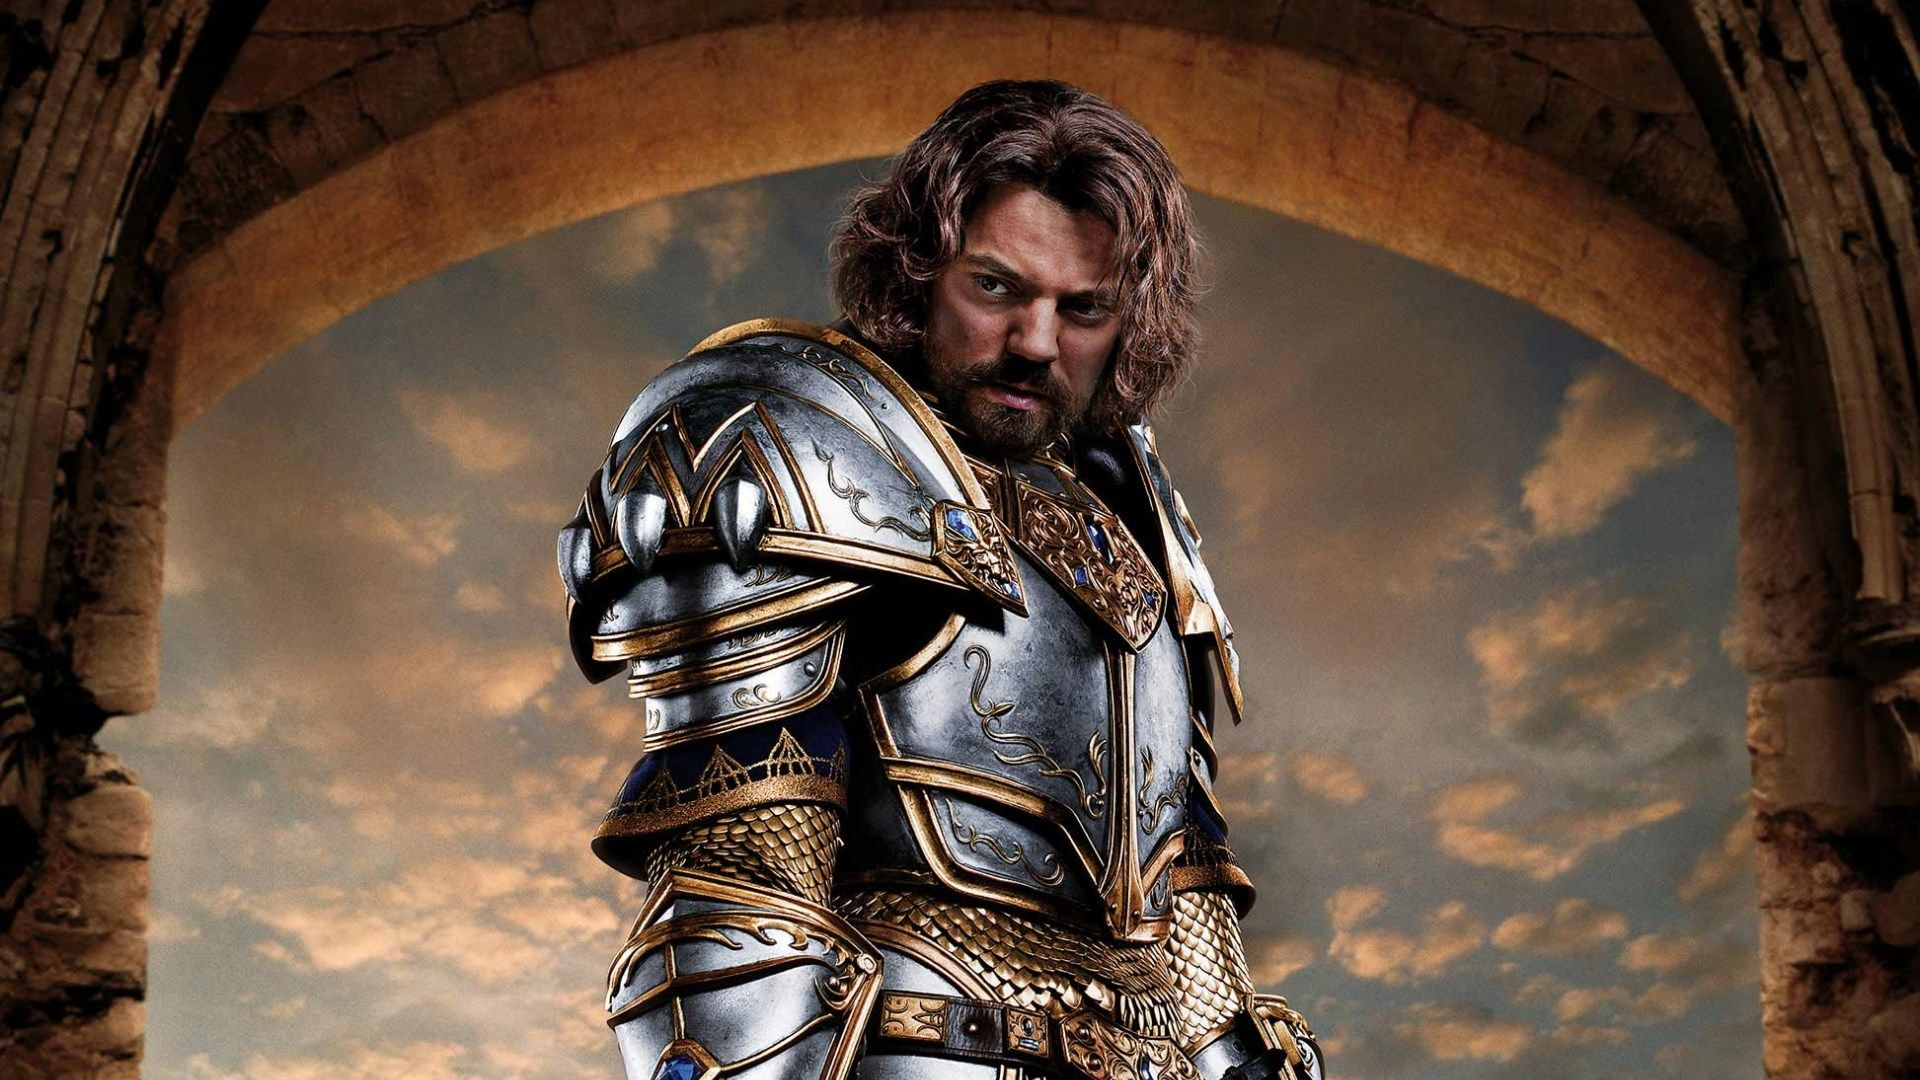 Anduin Lothar Warcraft 2016 Images